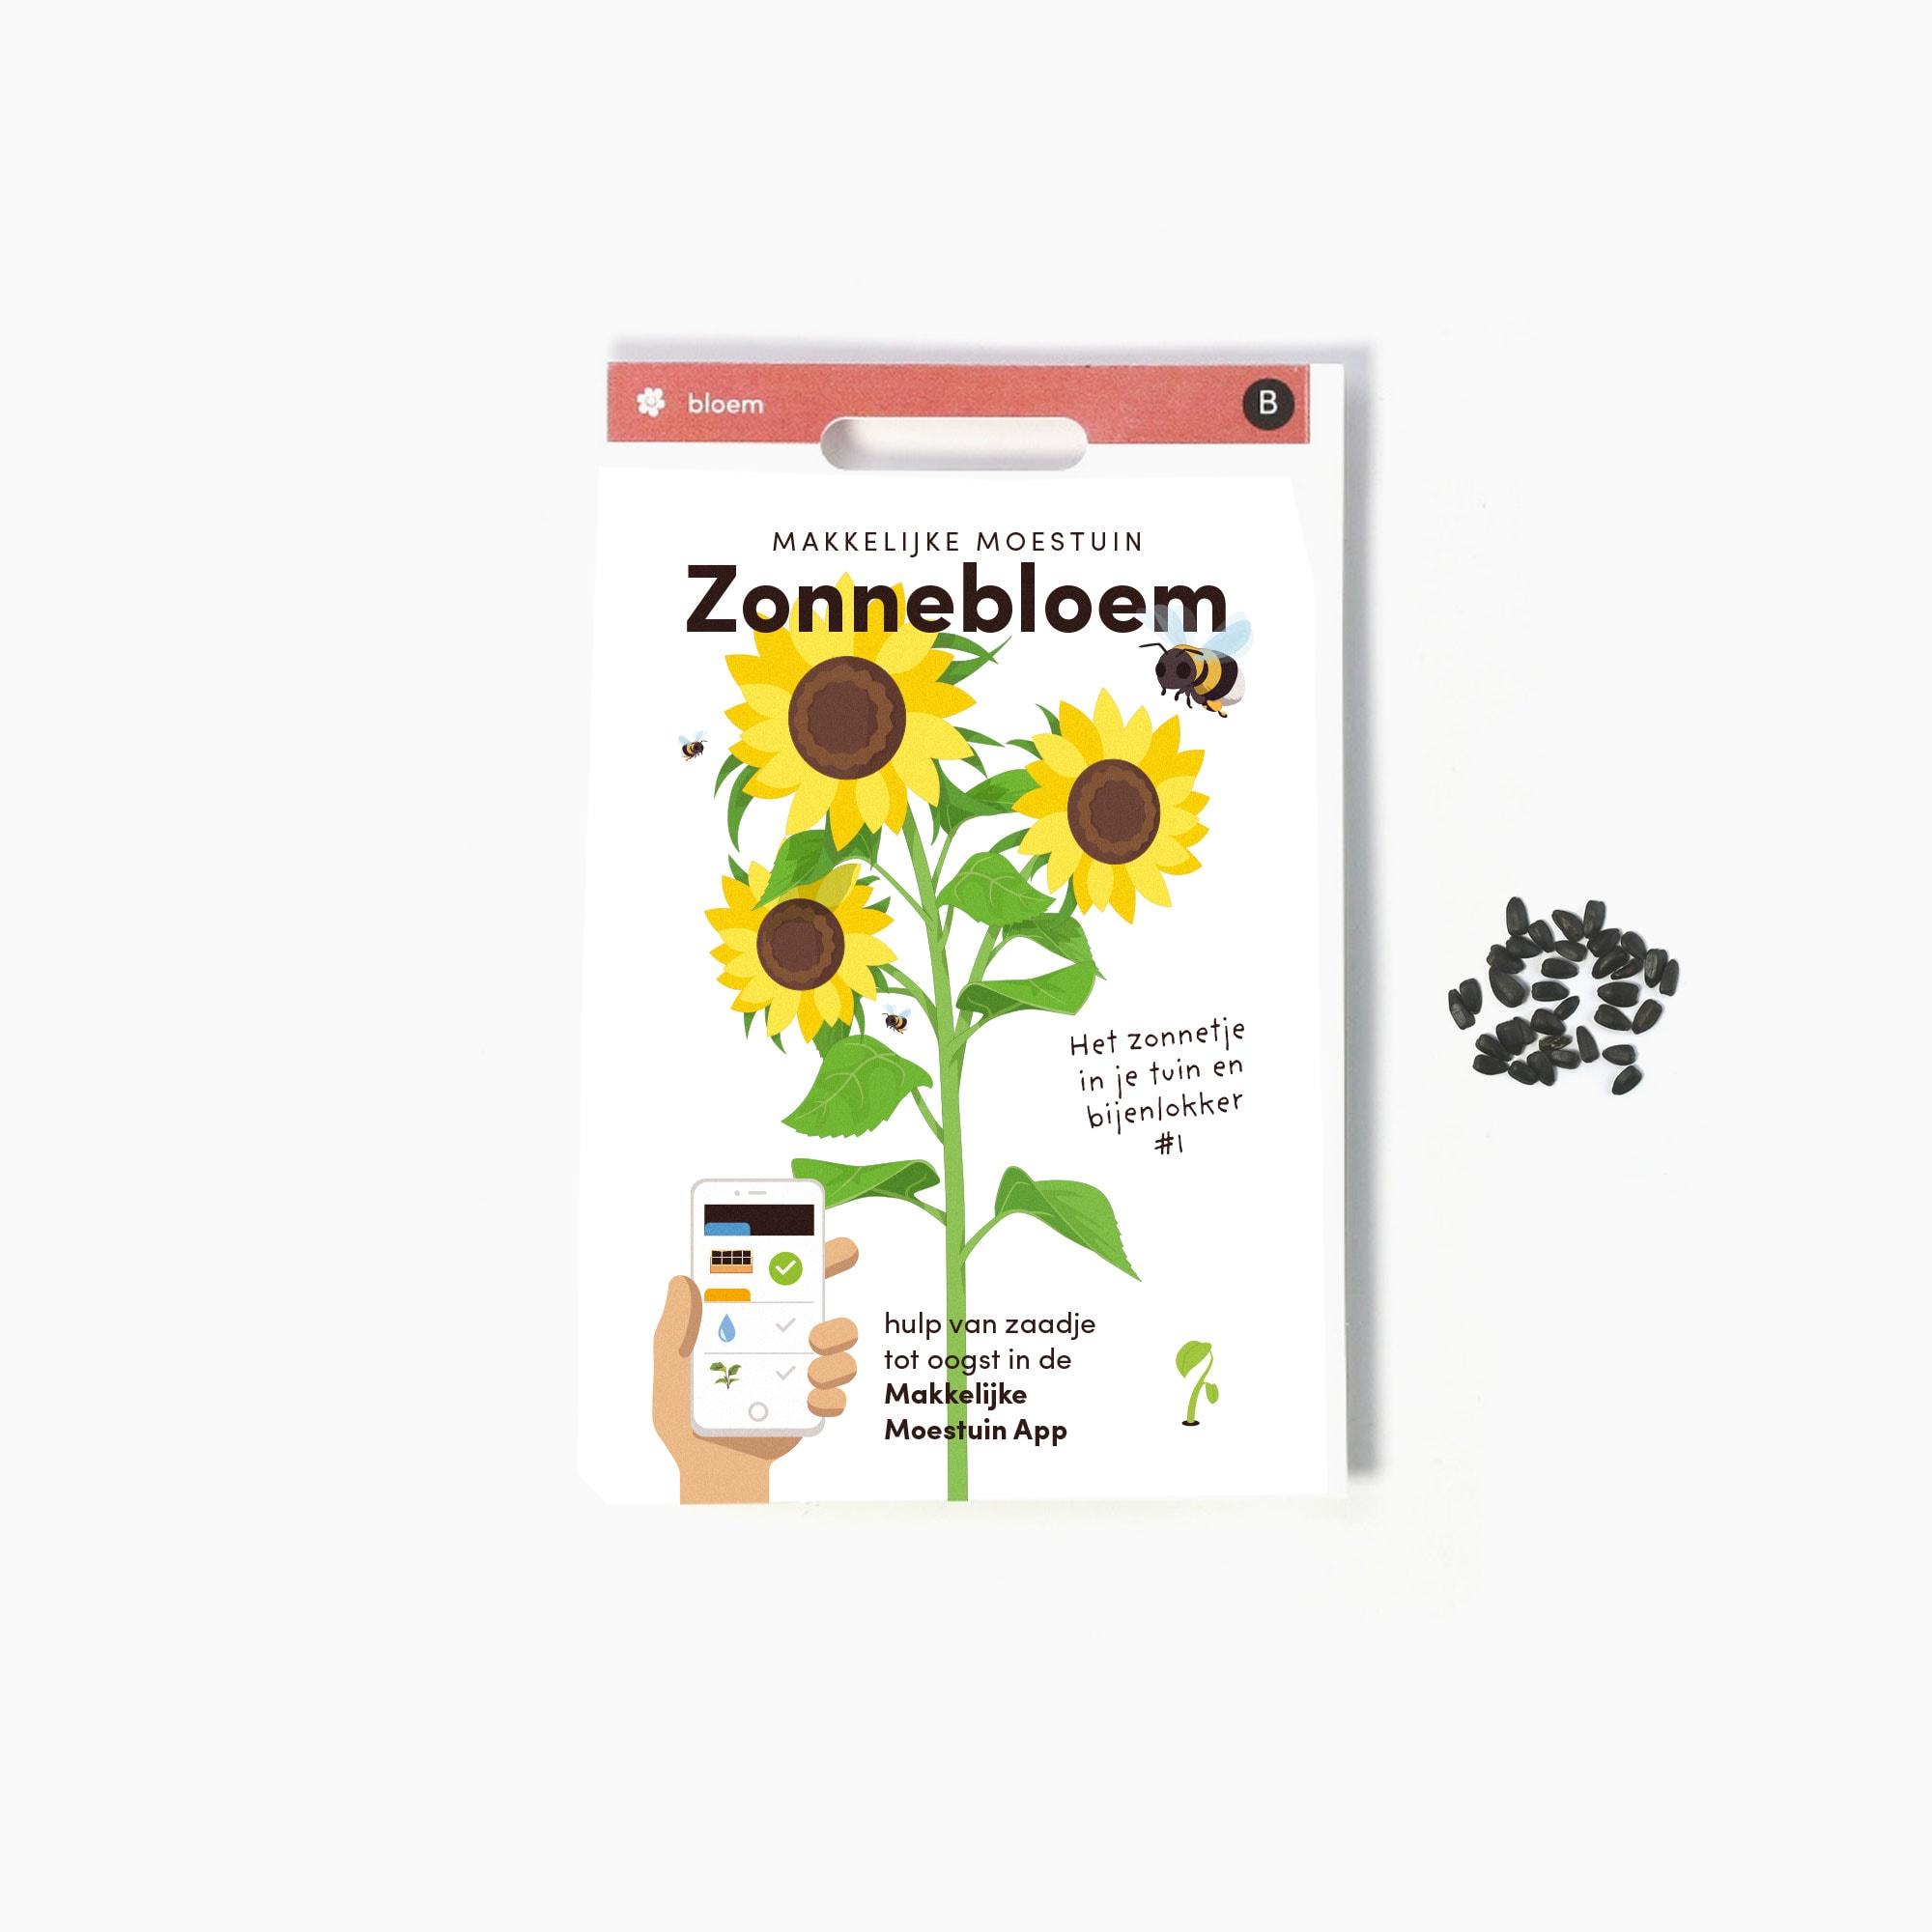 Zonnebloem-(1).jpg